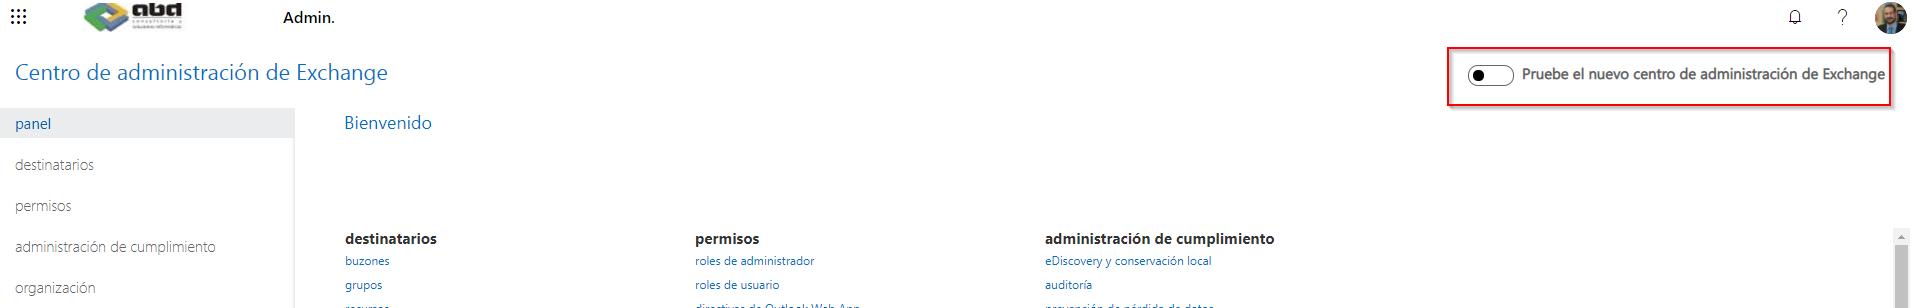 Píldora de Administradores de Microsoft 365: Nuevo Centro de Administración de Exchange.